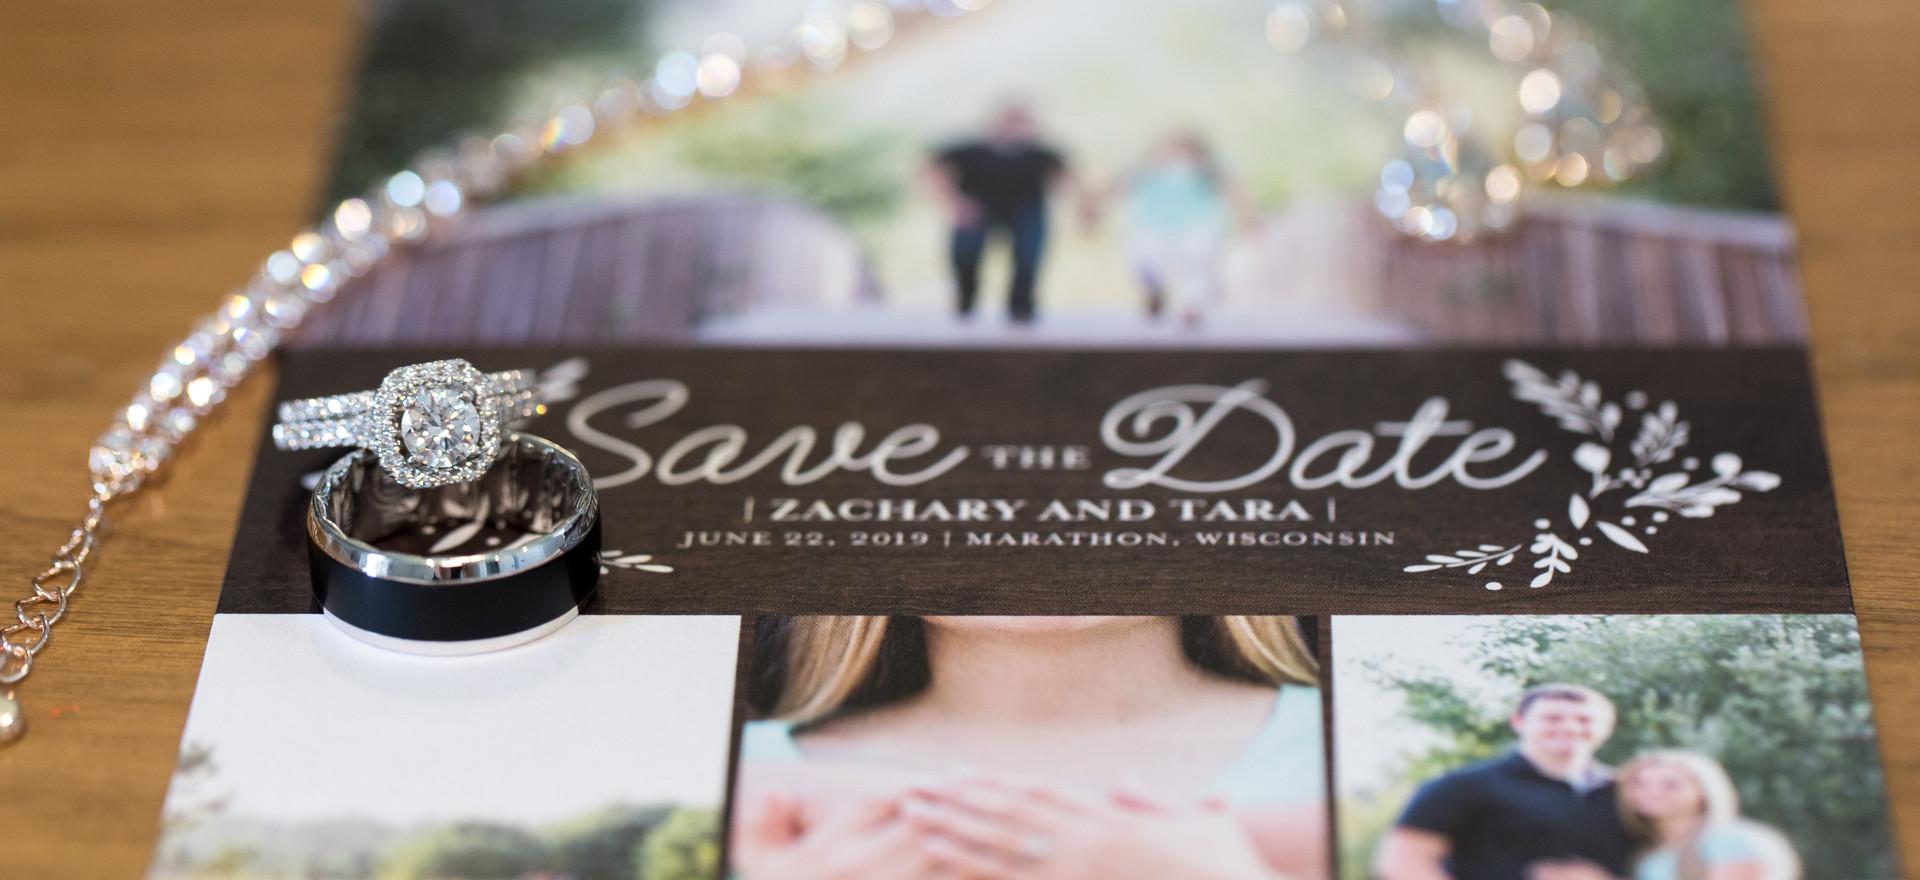 Tara-Zack-Wedding-2019-0021.jpg